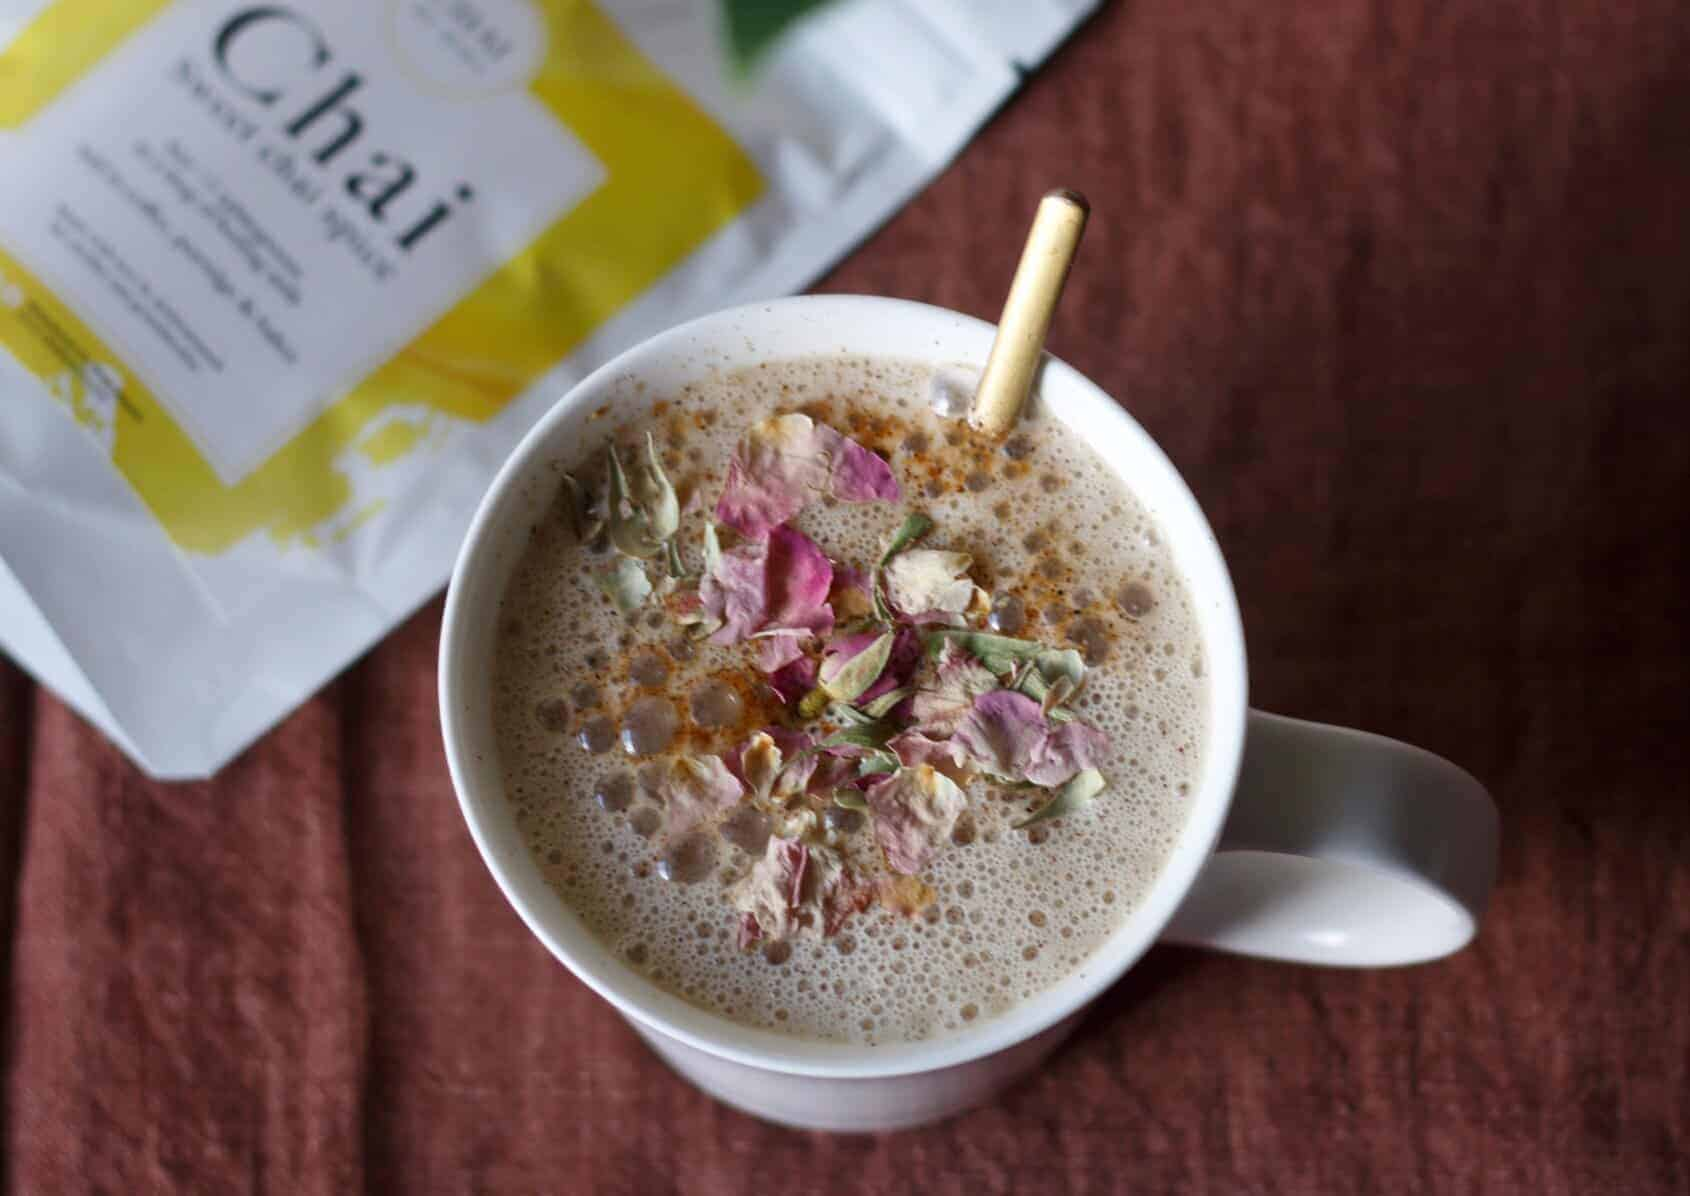 Ayurveda: Enjoying Chai in the Winter